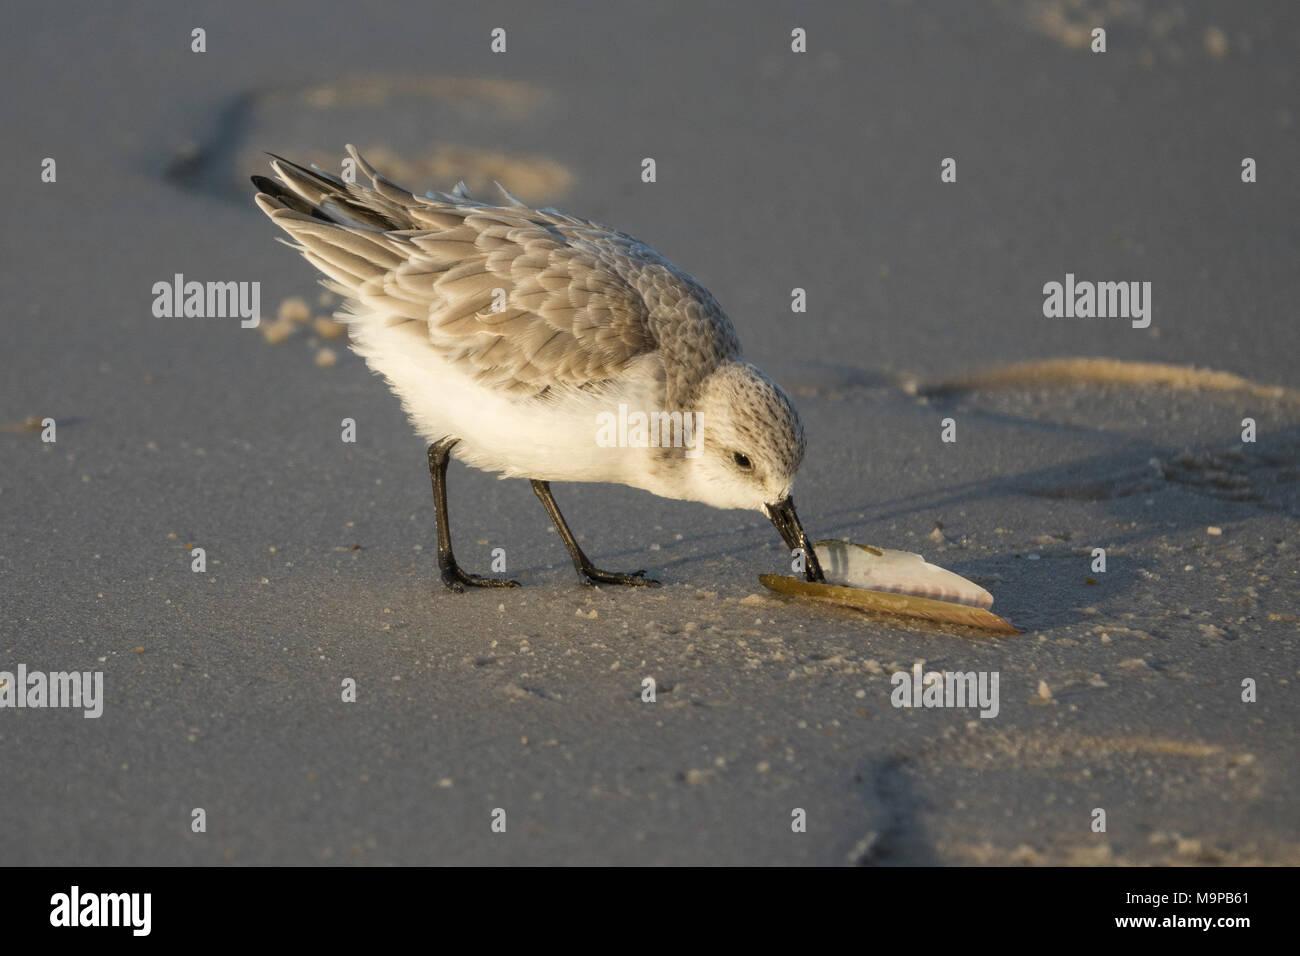 Sanderling (Calidris alba) picks on seashell, Sylt, North Frisia, Schleswig-Holstein, Germany - Stock Image